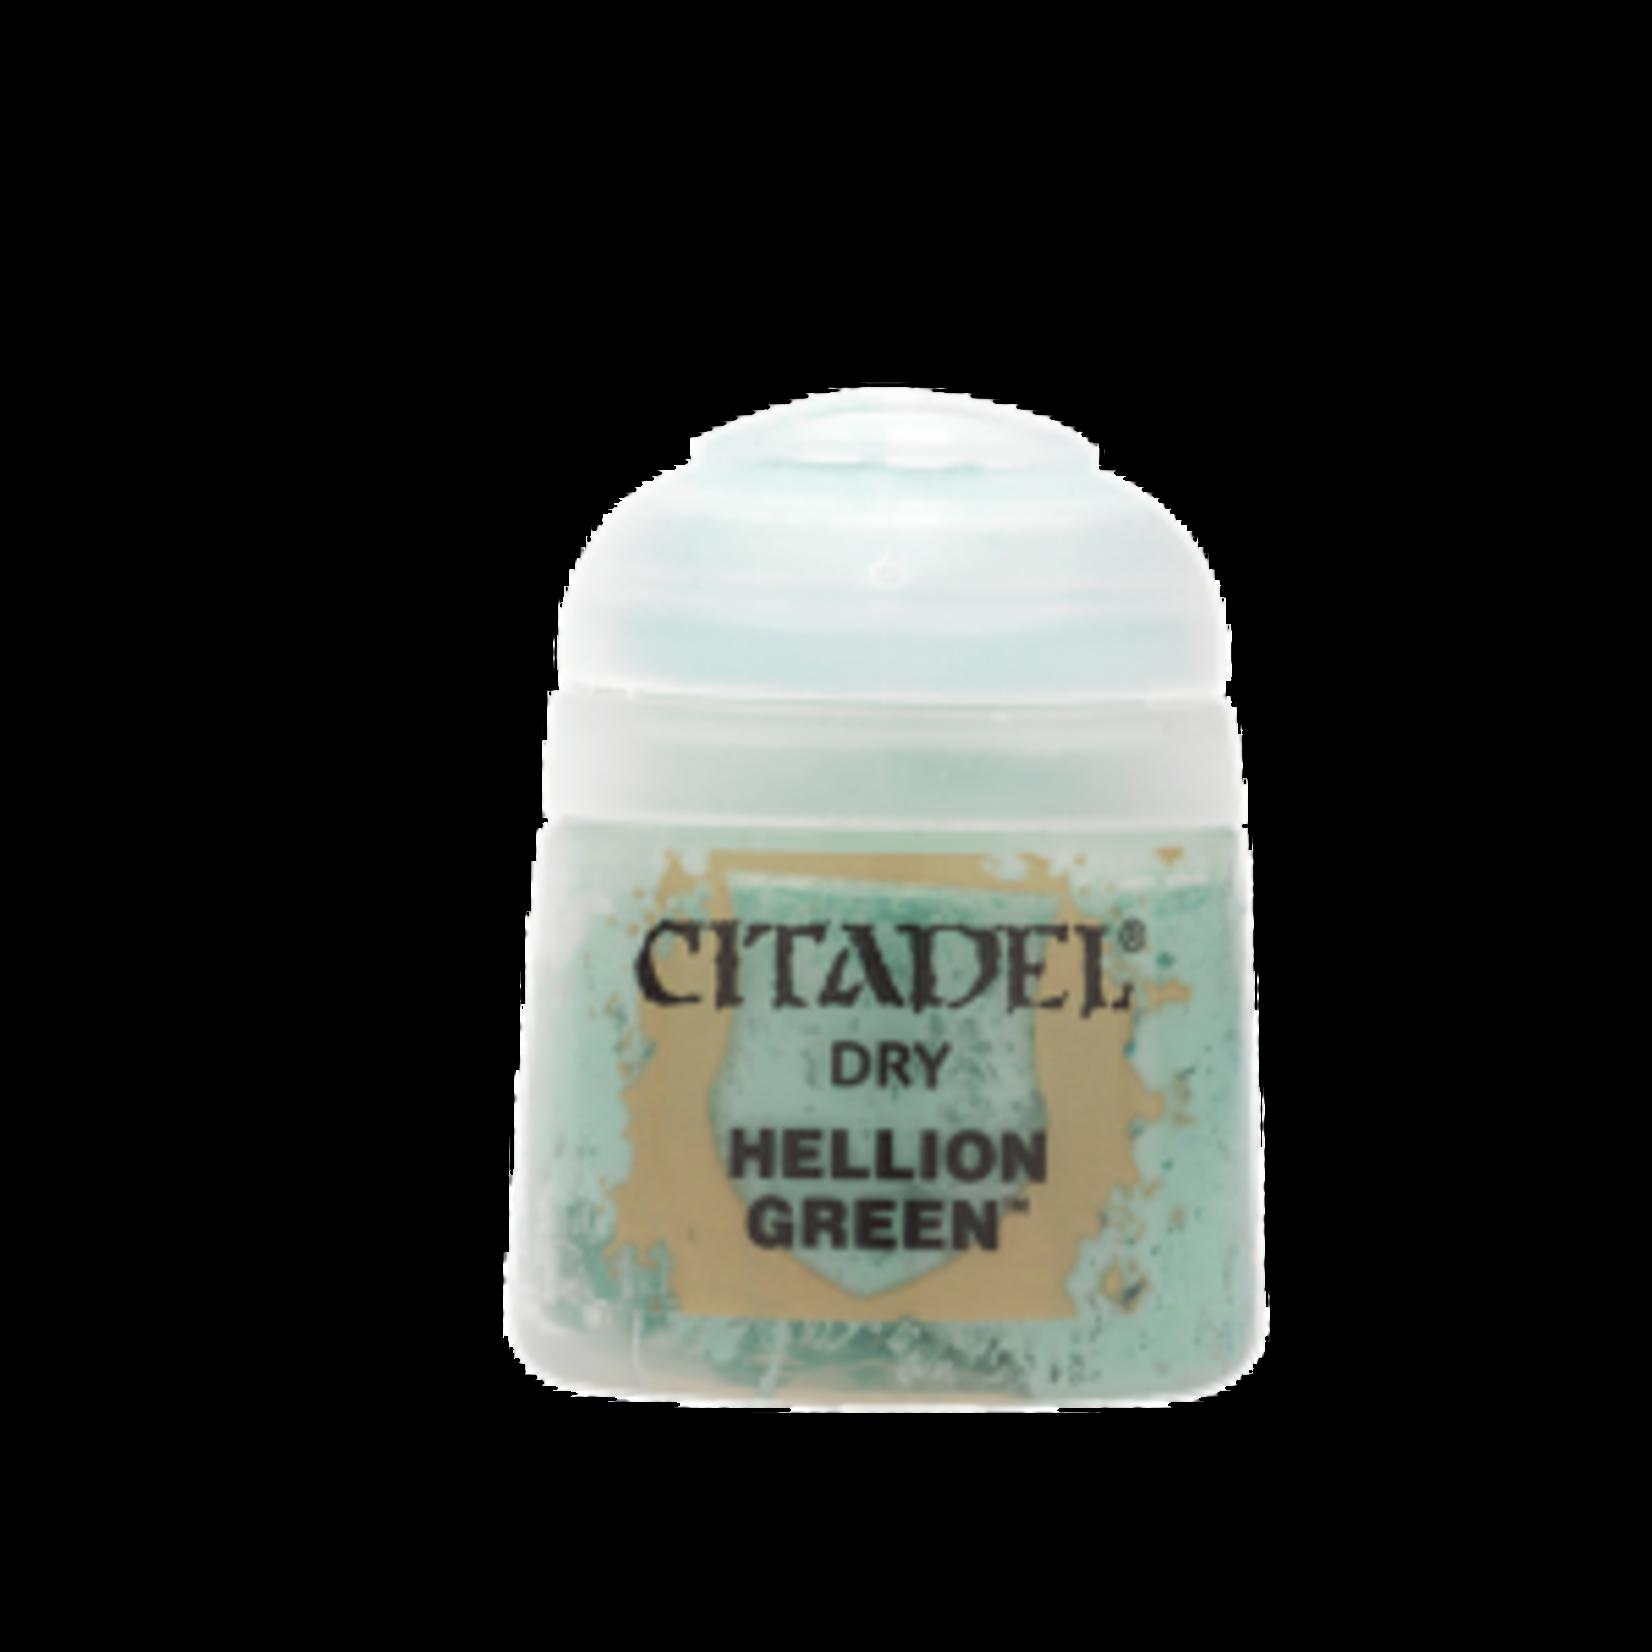 Citadel Dry Hellion Green